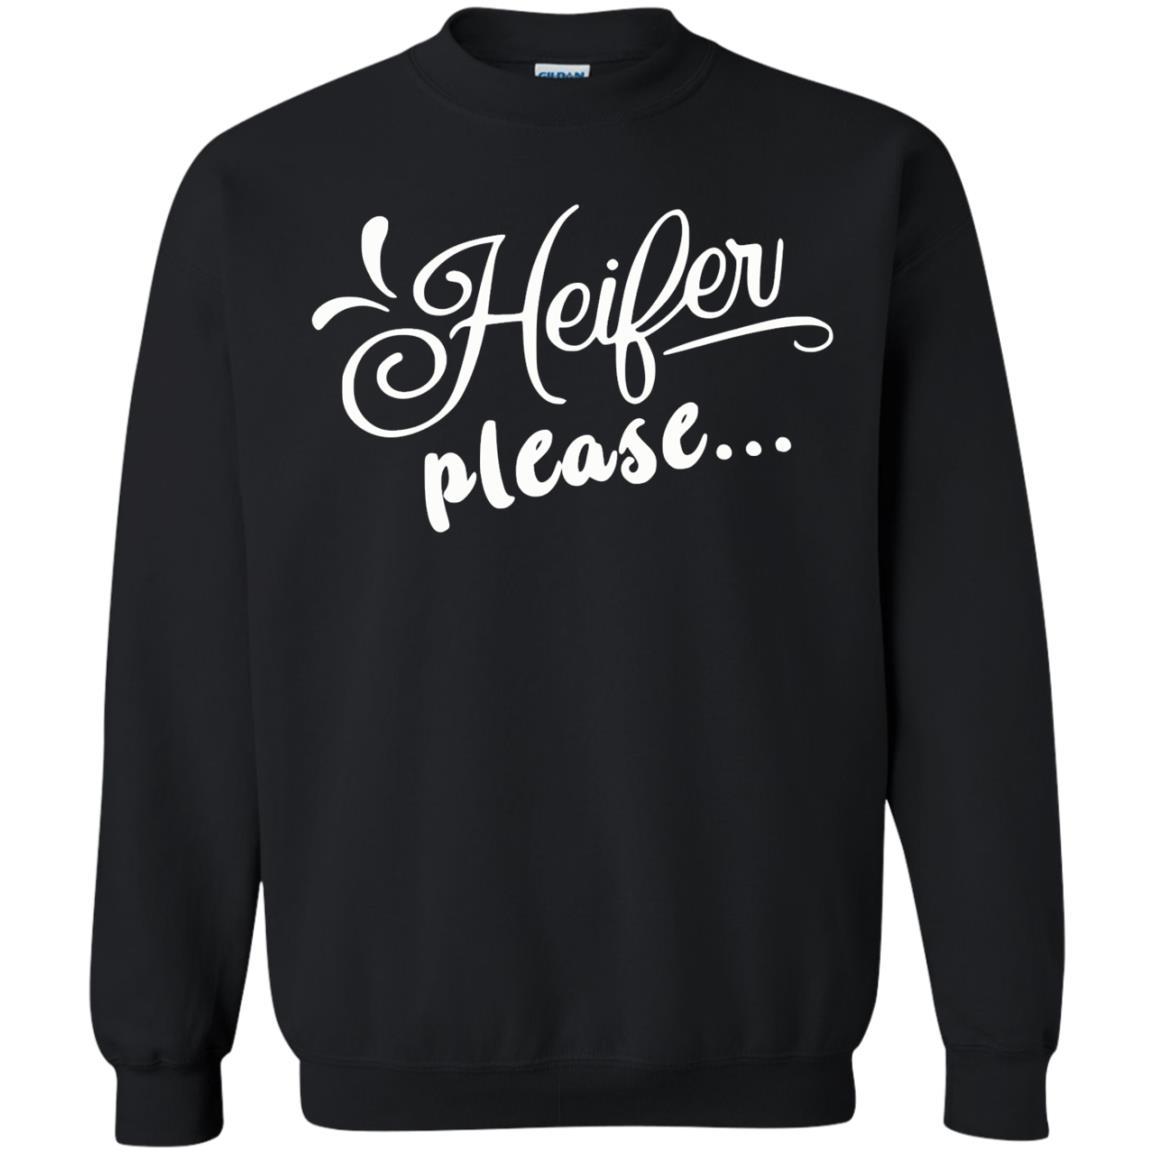 image 2151 - Heifer Please shirt, sweater: funny farmer apparel